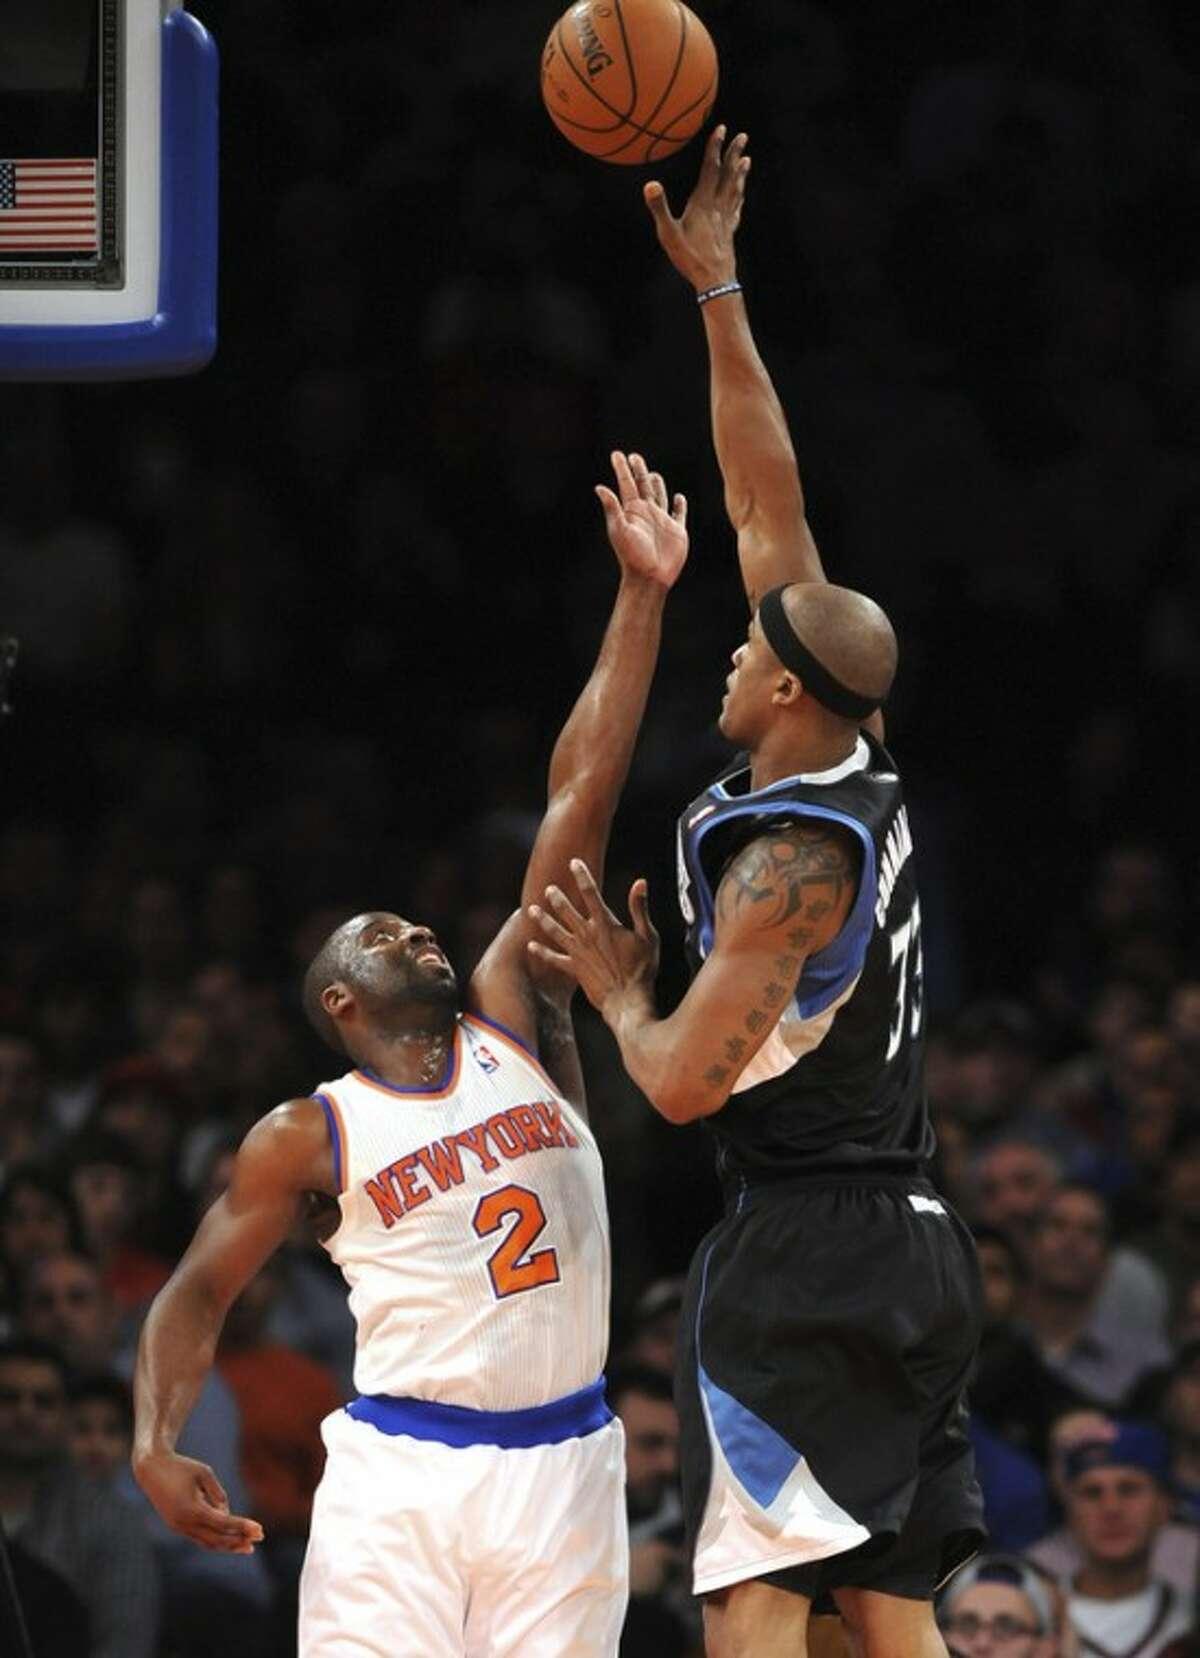 Minnesota Timberwolves' Dante Cunningham (33) shoots over New York Knicks' Raymond Felton (2) in the first half of an NBA basketball game on Sunday, Dec., 23, 2012, at Madison Square Garden in New York. (AP Photo/Kathy Kmonicek)